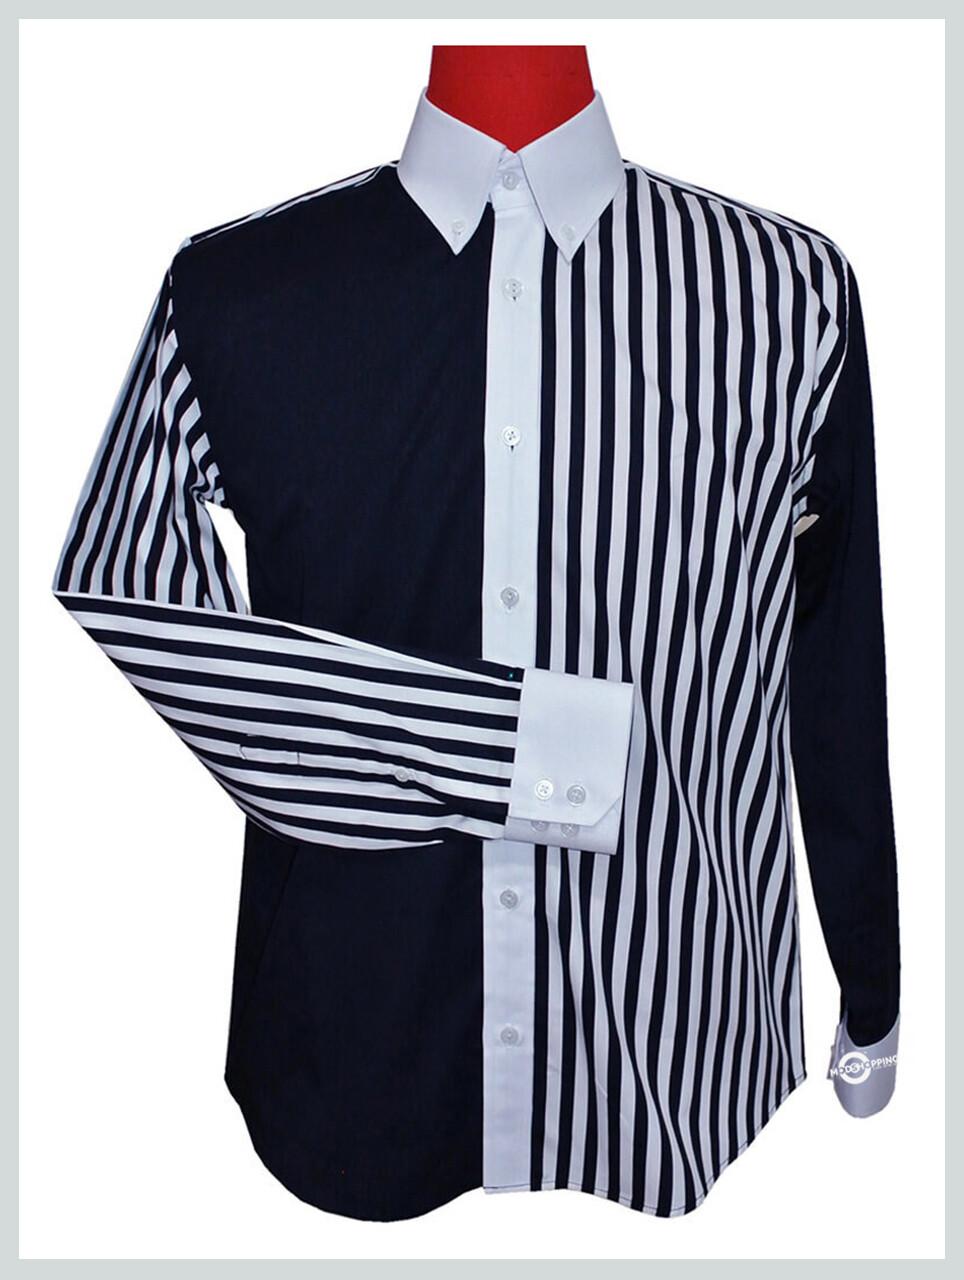 Button Down Shirt| Roger Daltrey Classic Mod Navy Blue Shirt